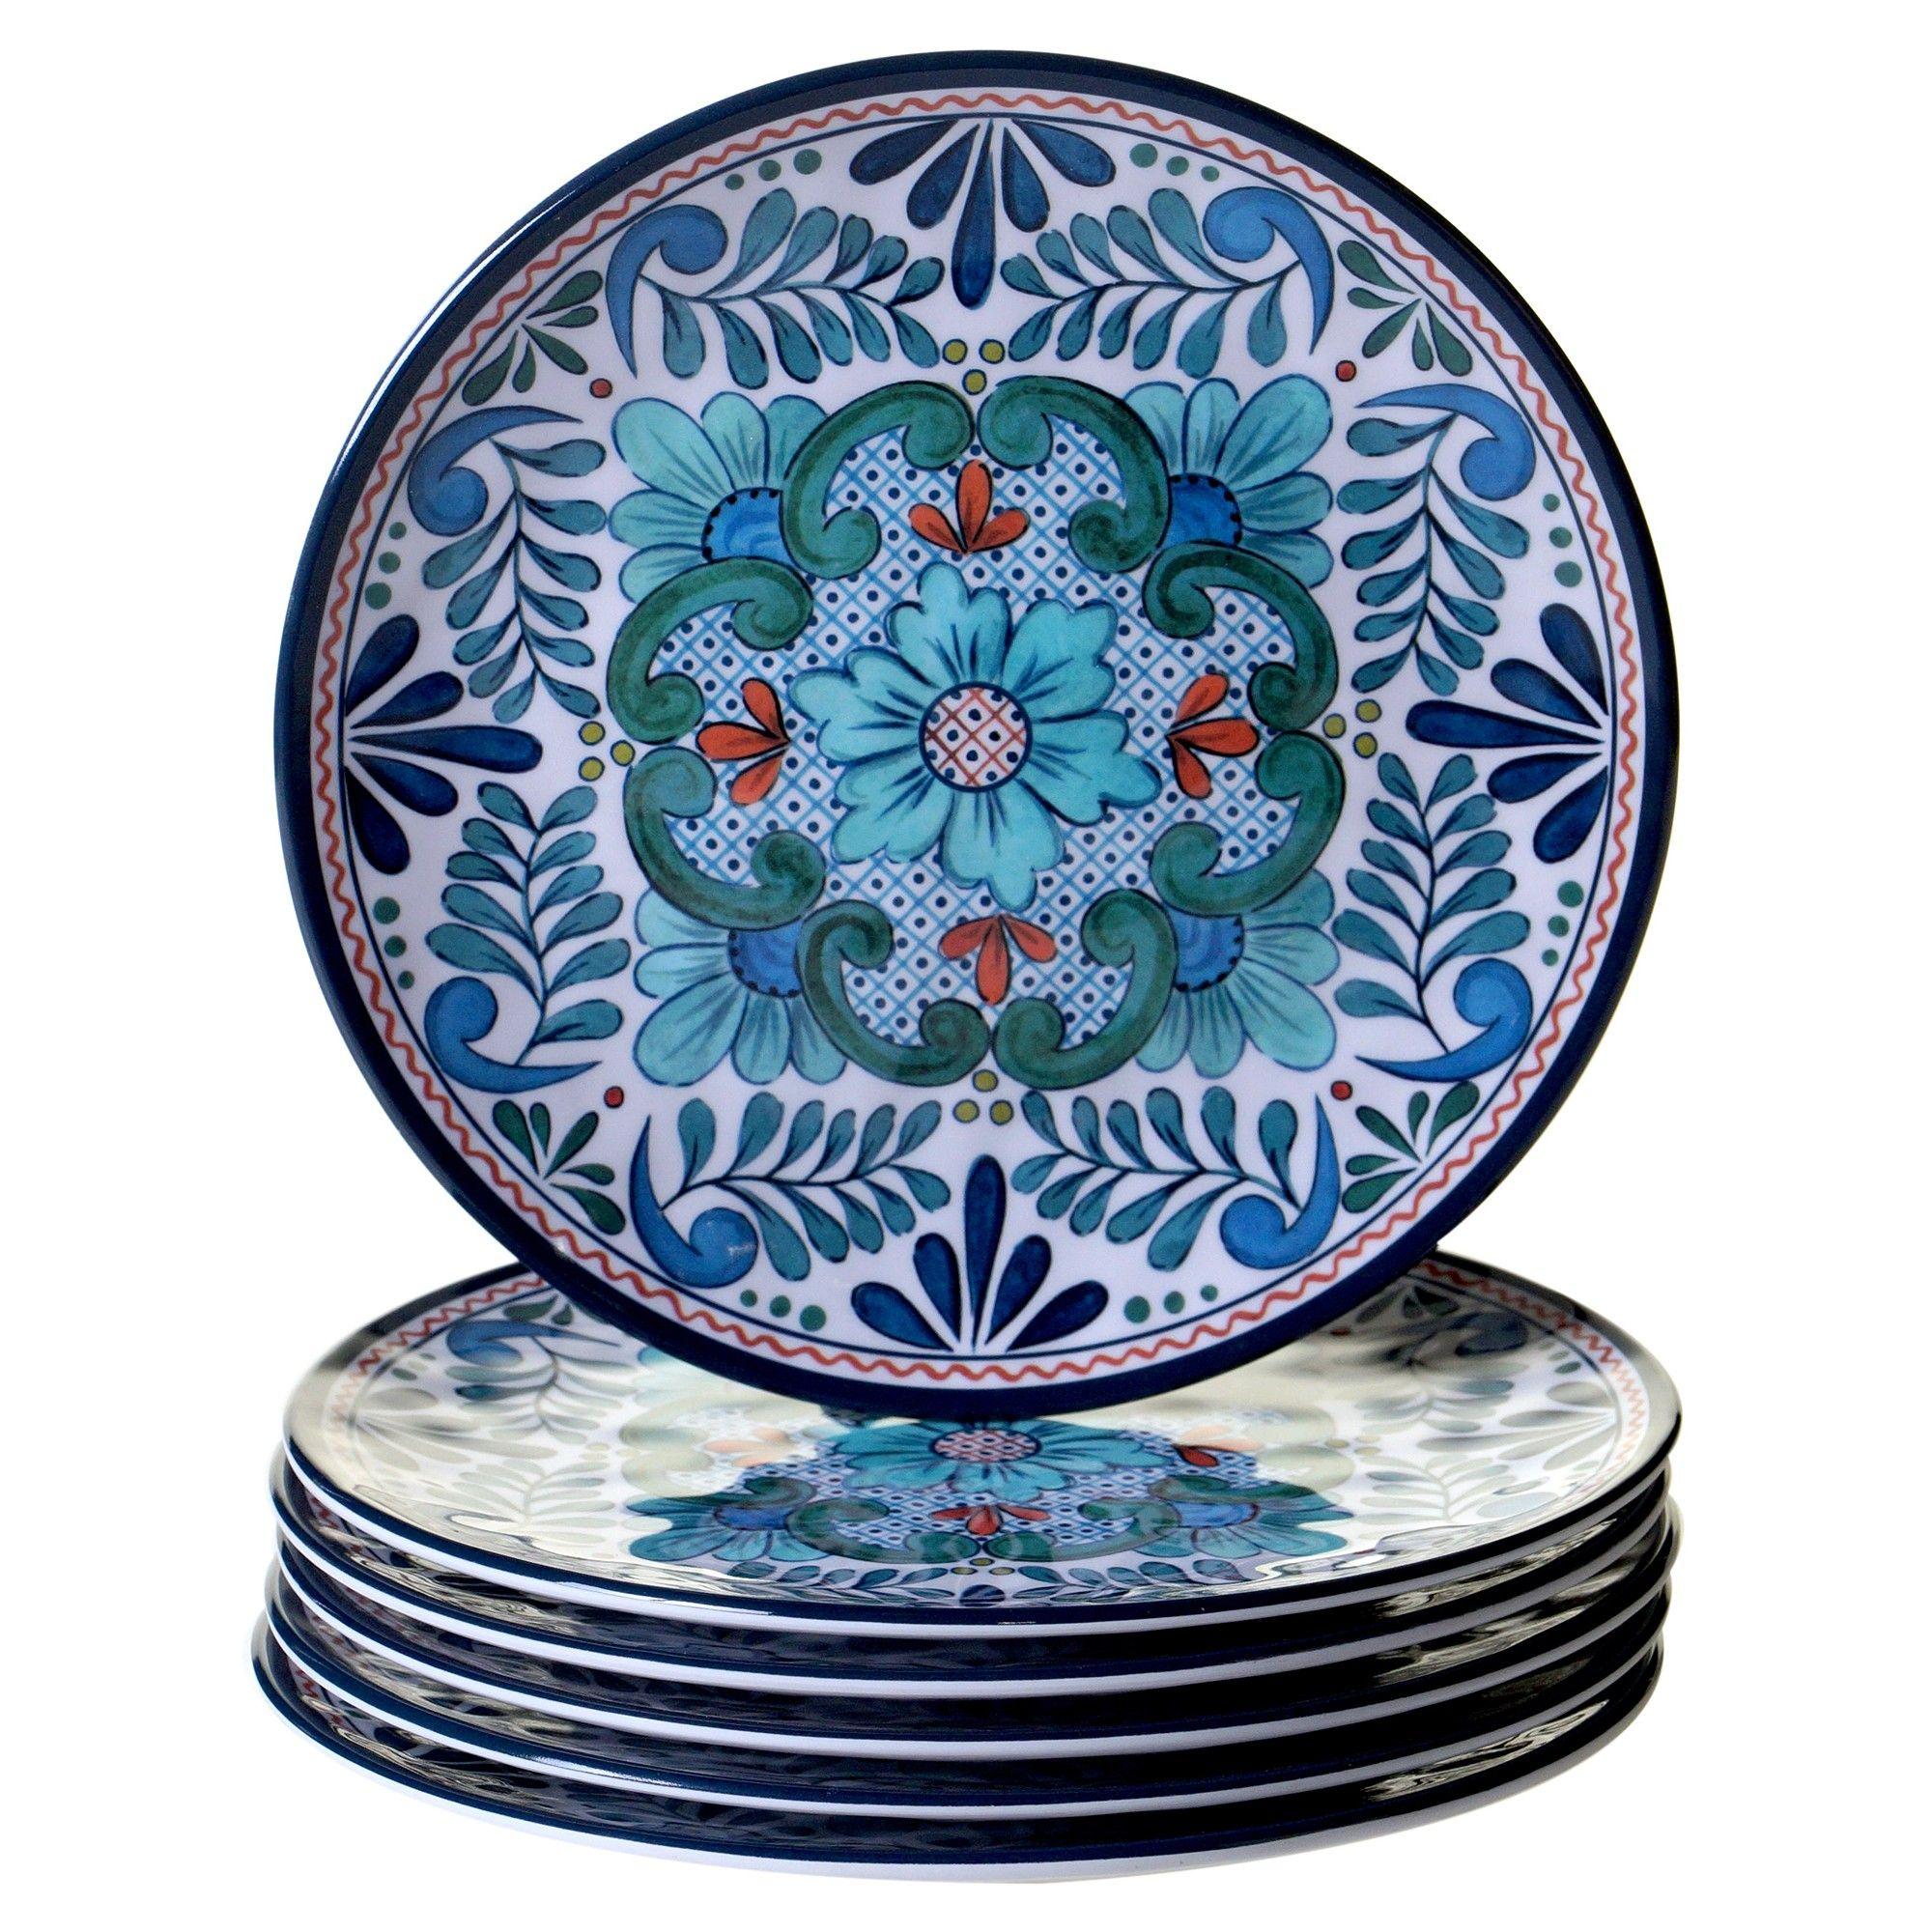 Certified International Talavera by Nancy Green Melamine Salad Plates 9\  Blue - Set of 6  sc 1 st  Pinterest & Certified International Talavera by Nancy Green Melamine Salad ...